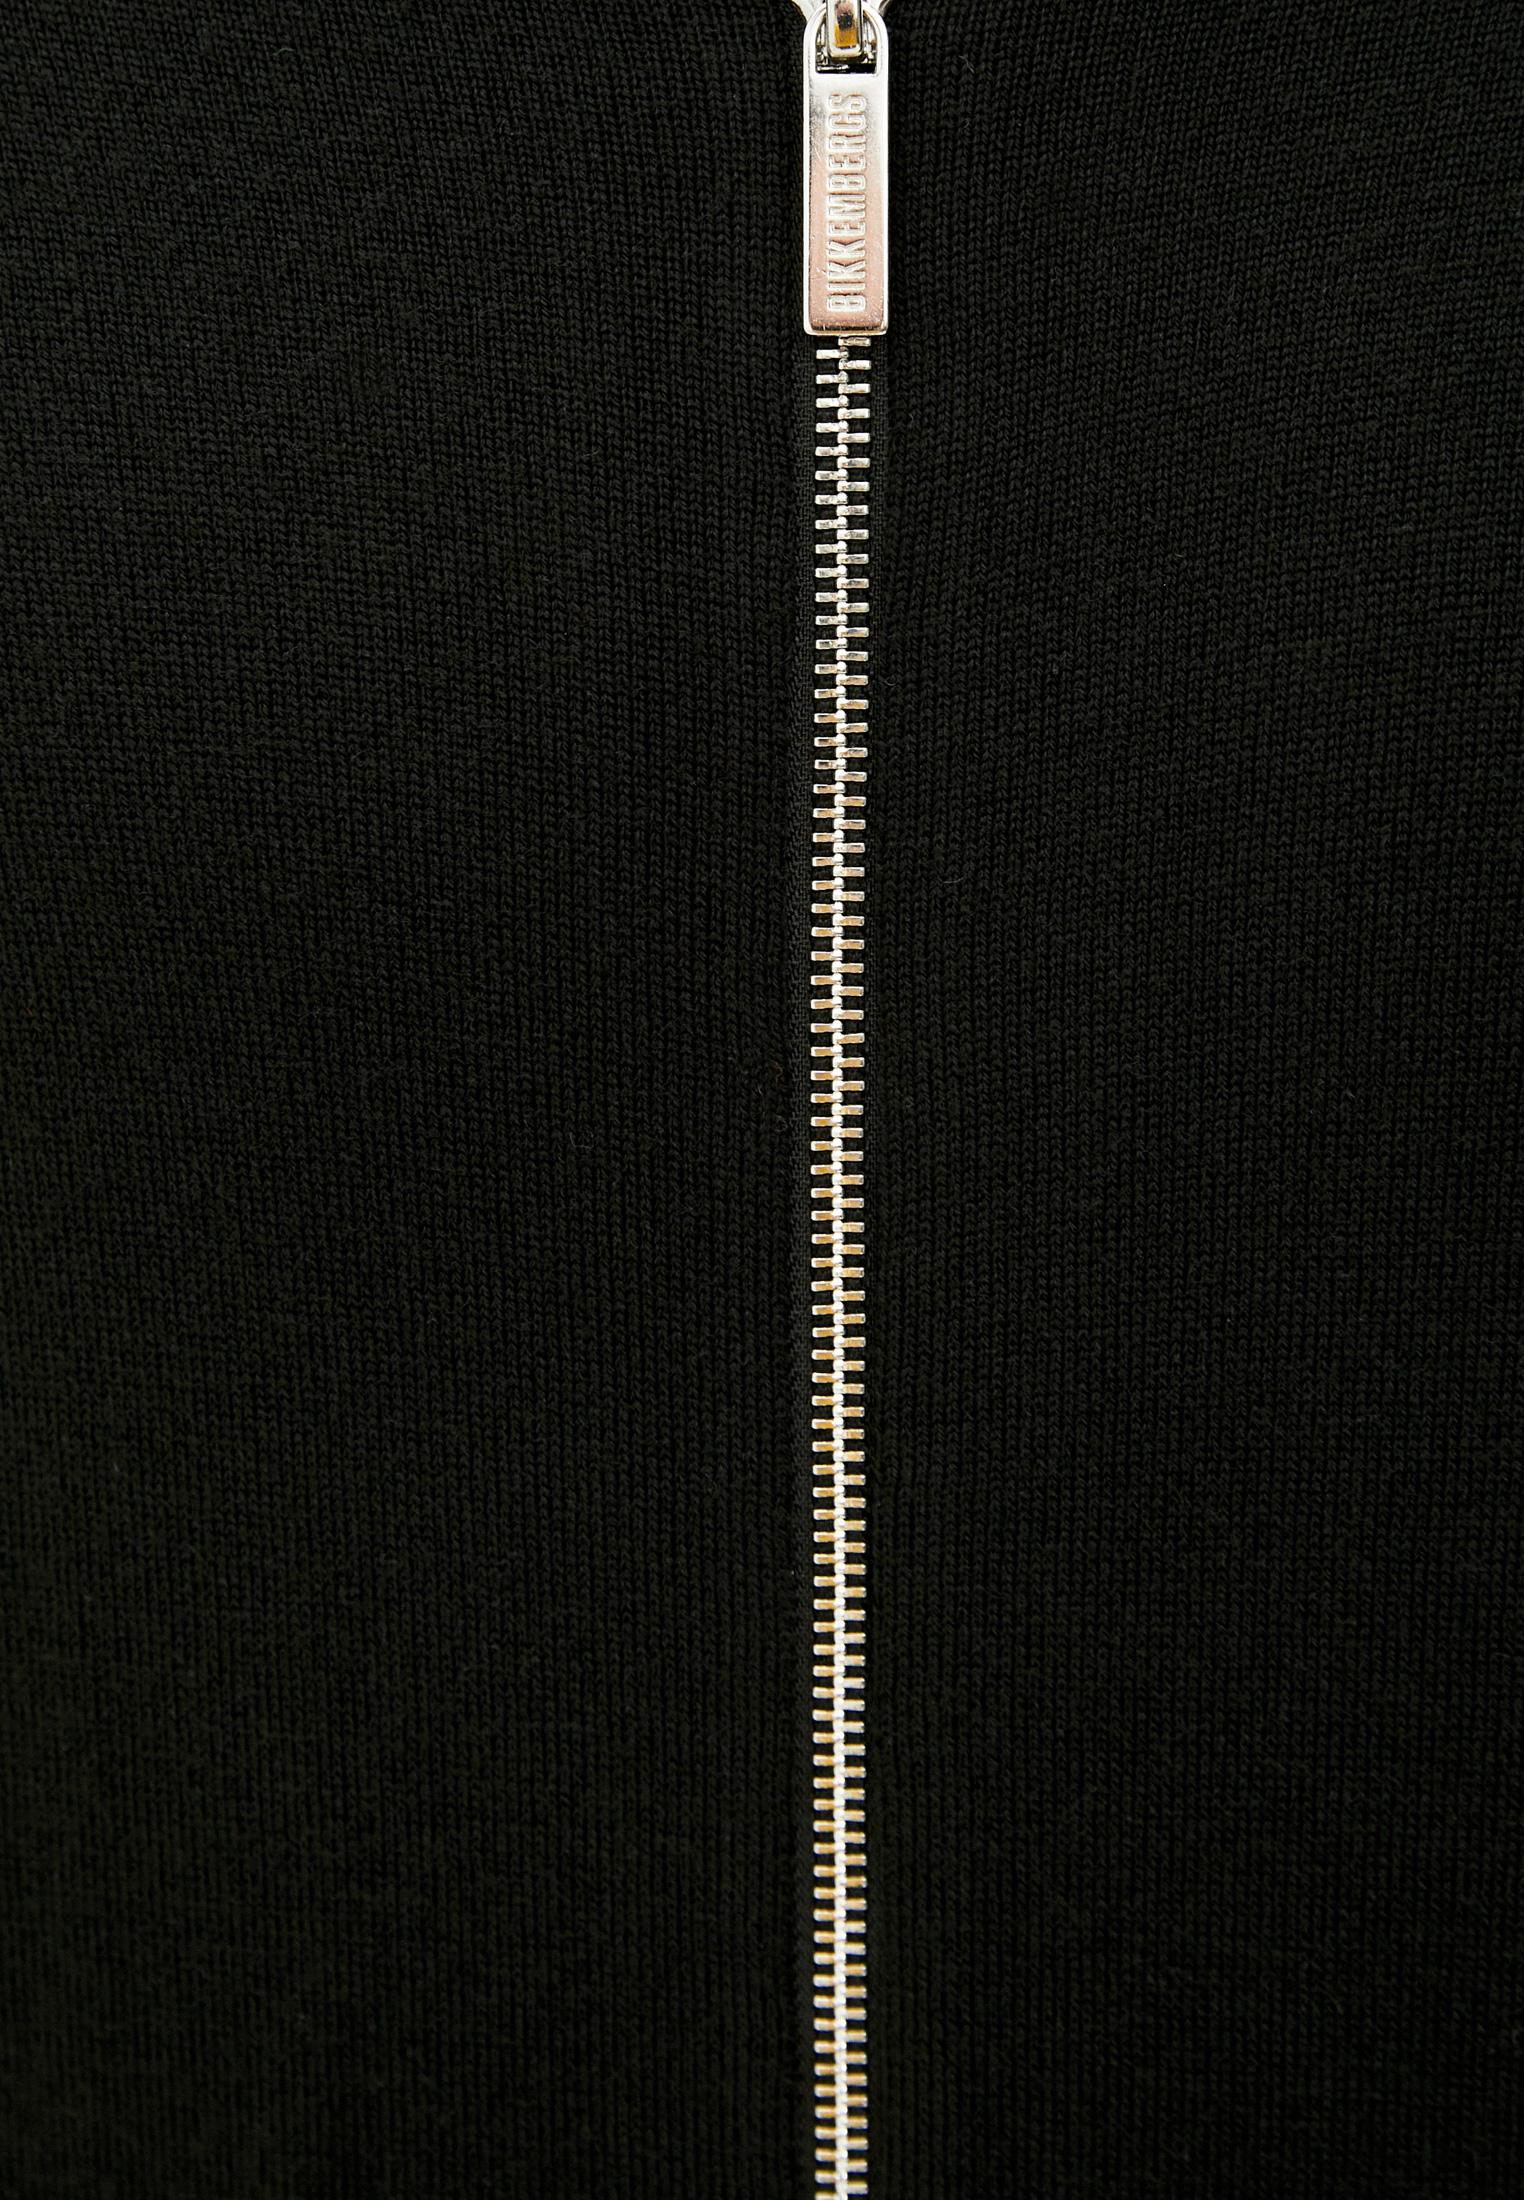 Кардиган Bikkembergs (Биккембергс) C S J25 10 X 1148: изображение 5